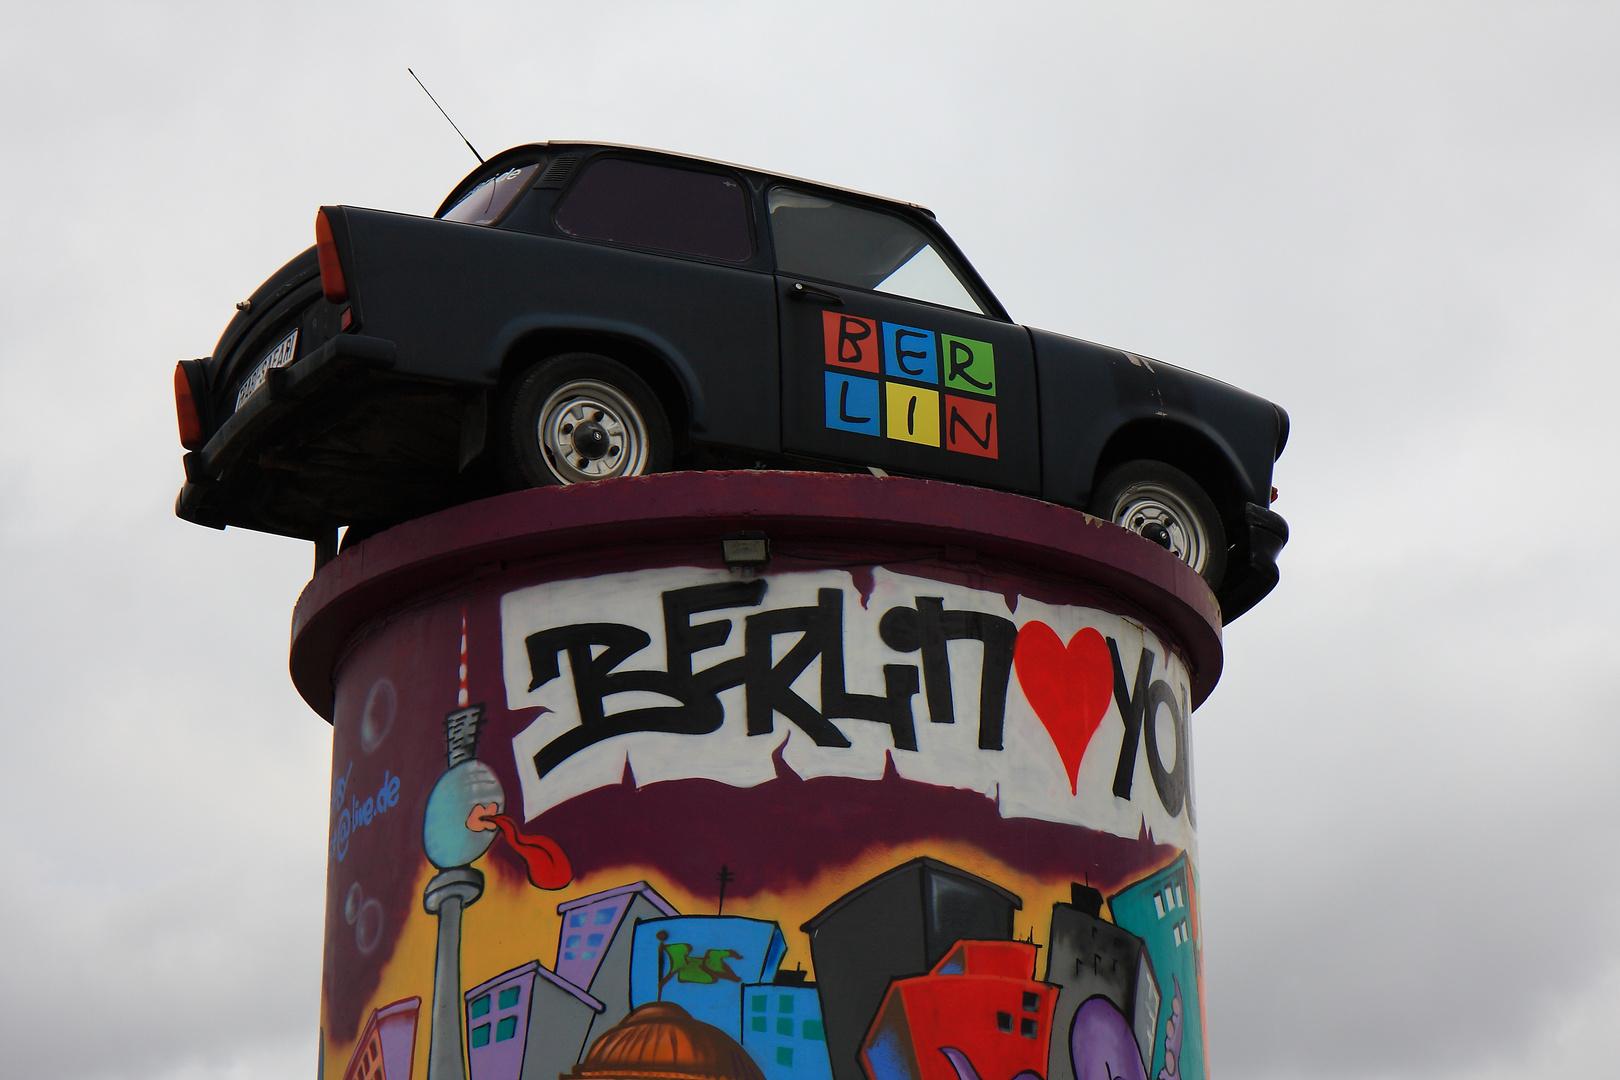 Berliner Rennpappe